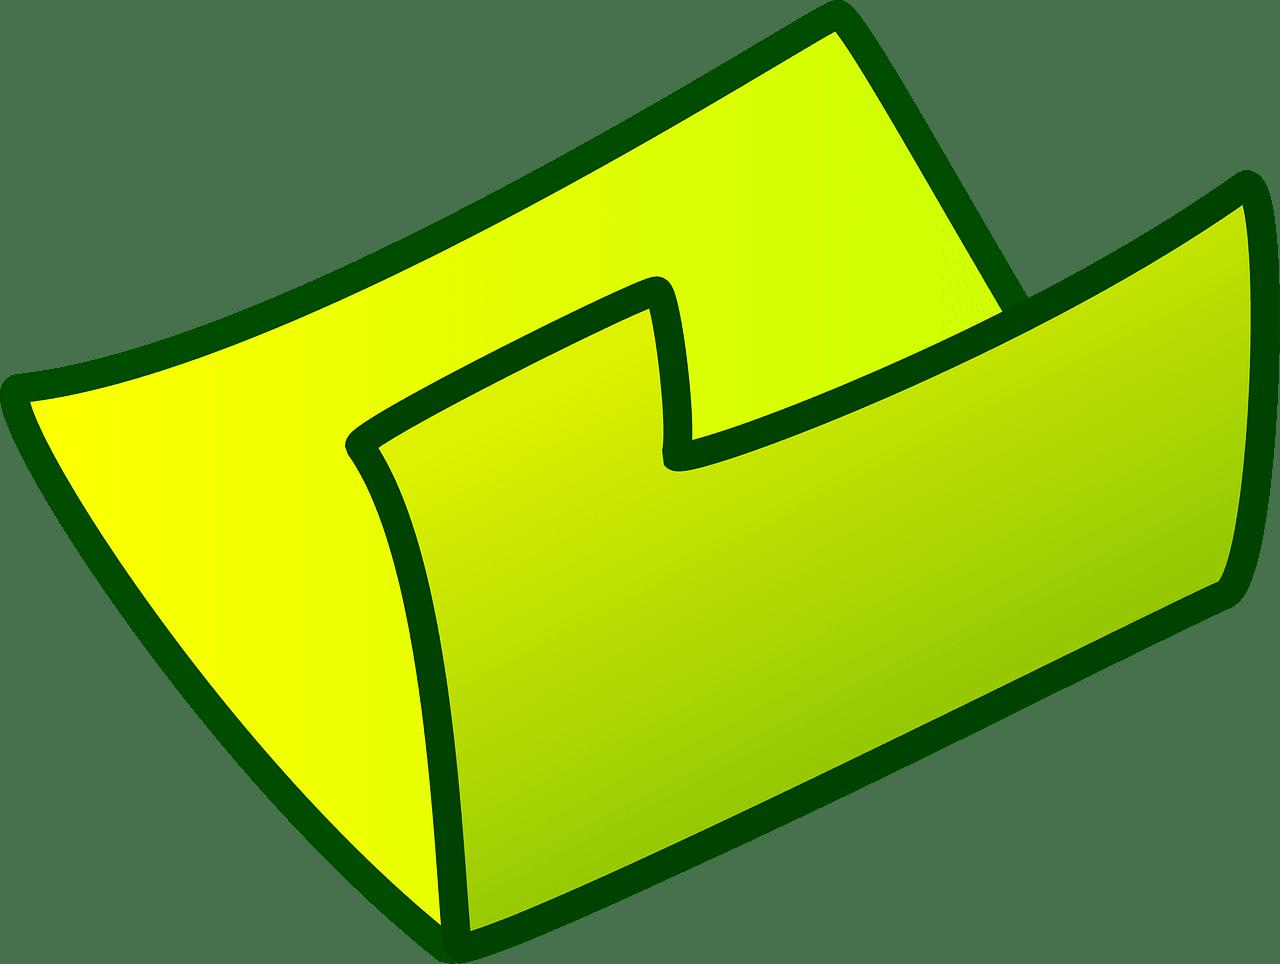 Folder clipart transparent for free